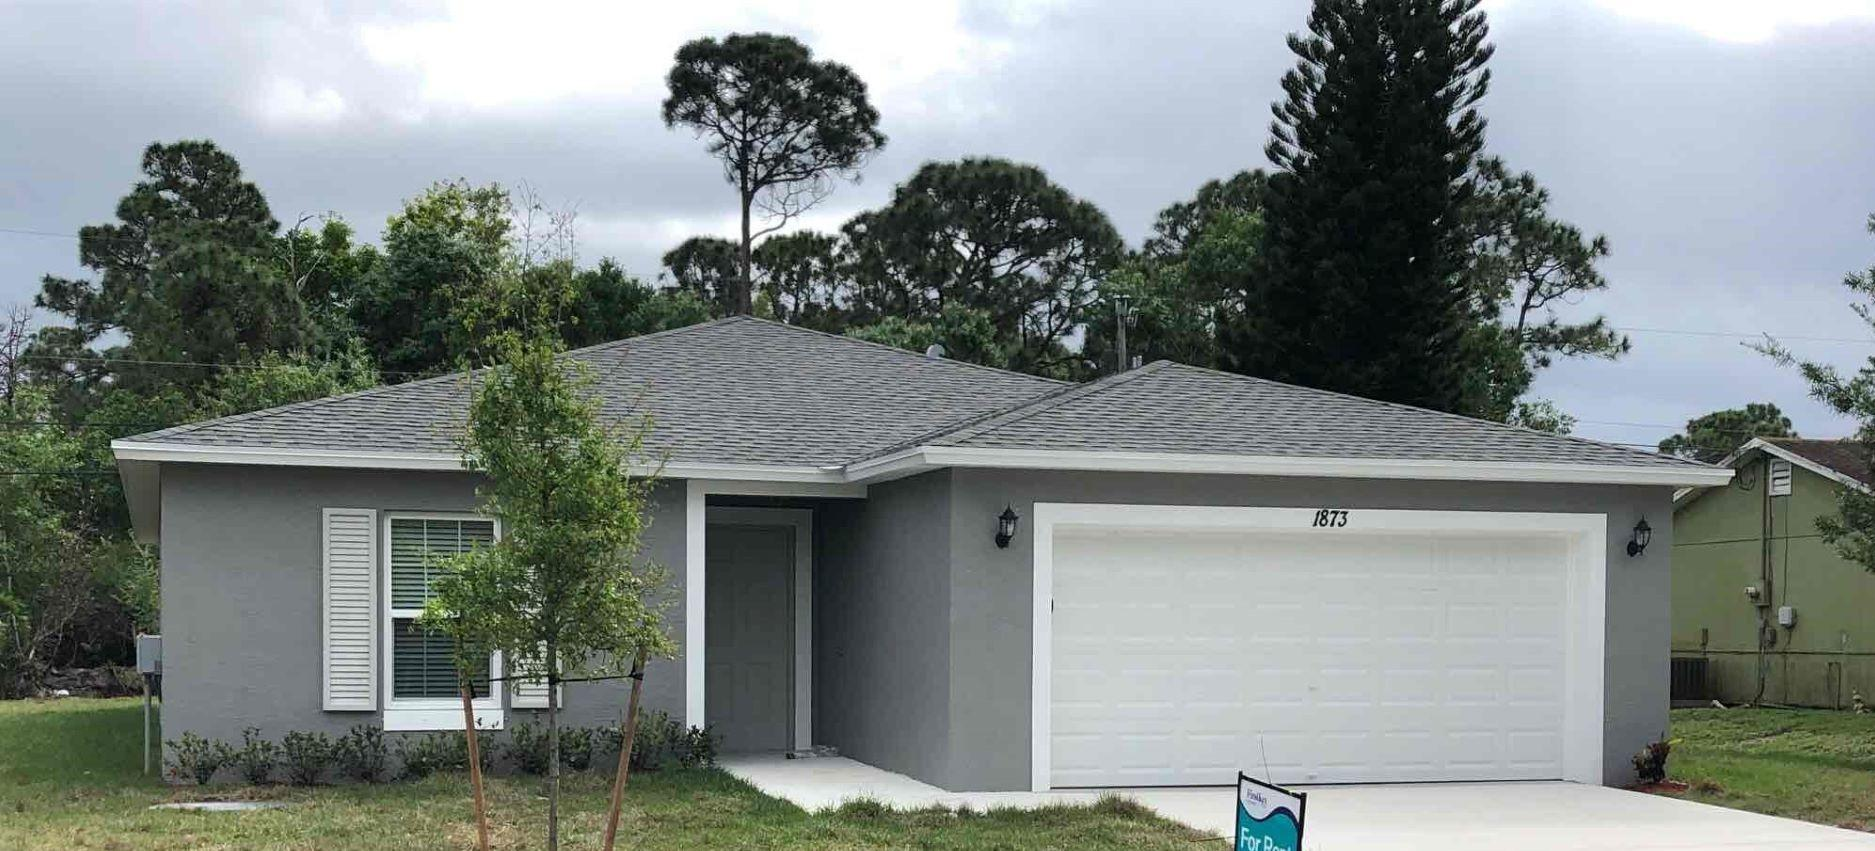 1873 Sw Logan Street, Port Saint Lucie, FL 34953